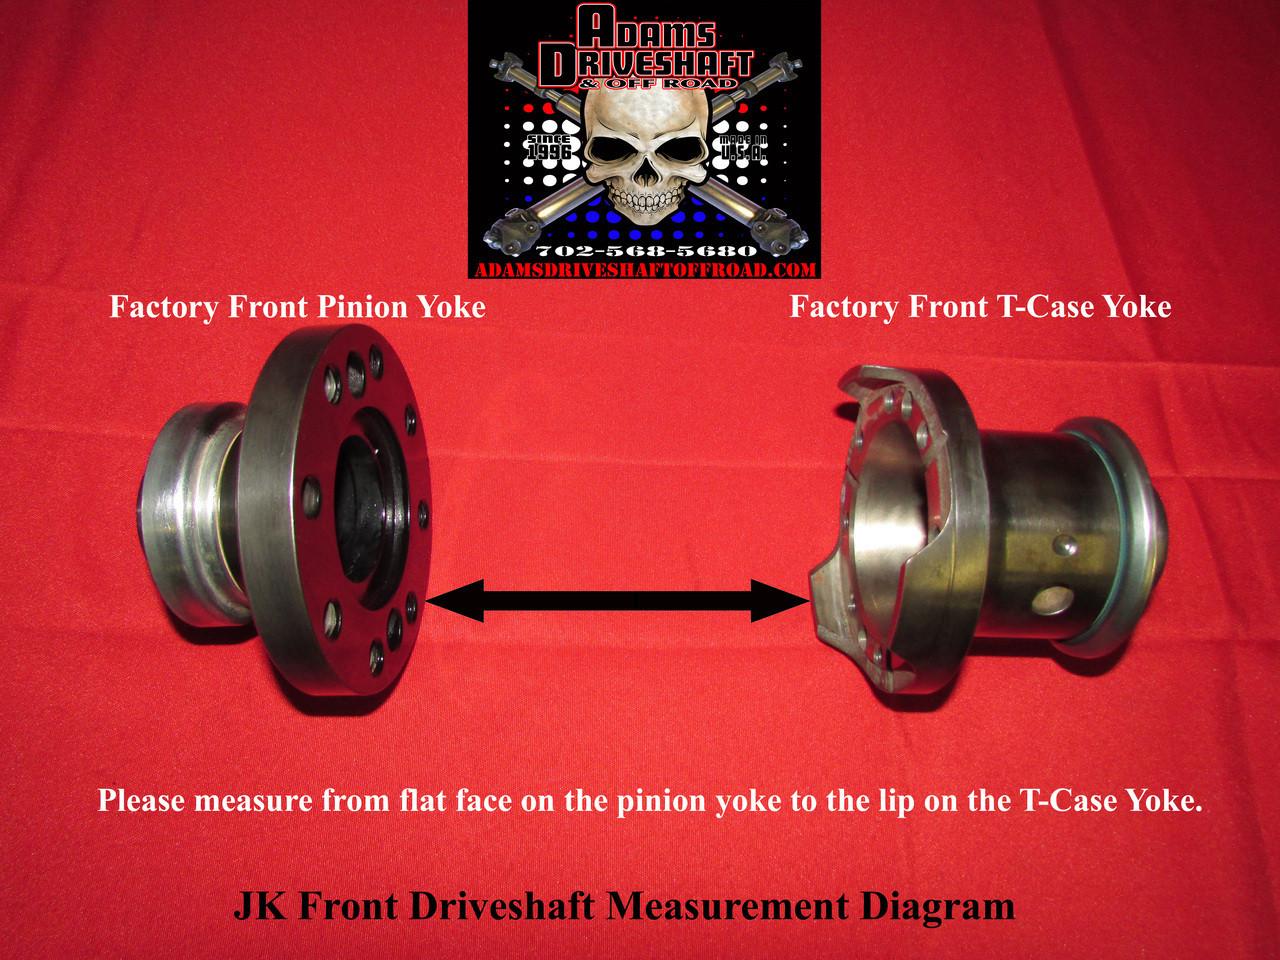 Driveshaft Measurement Required